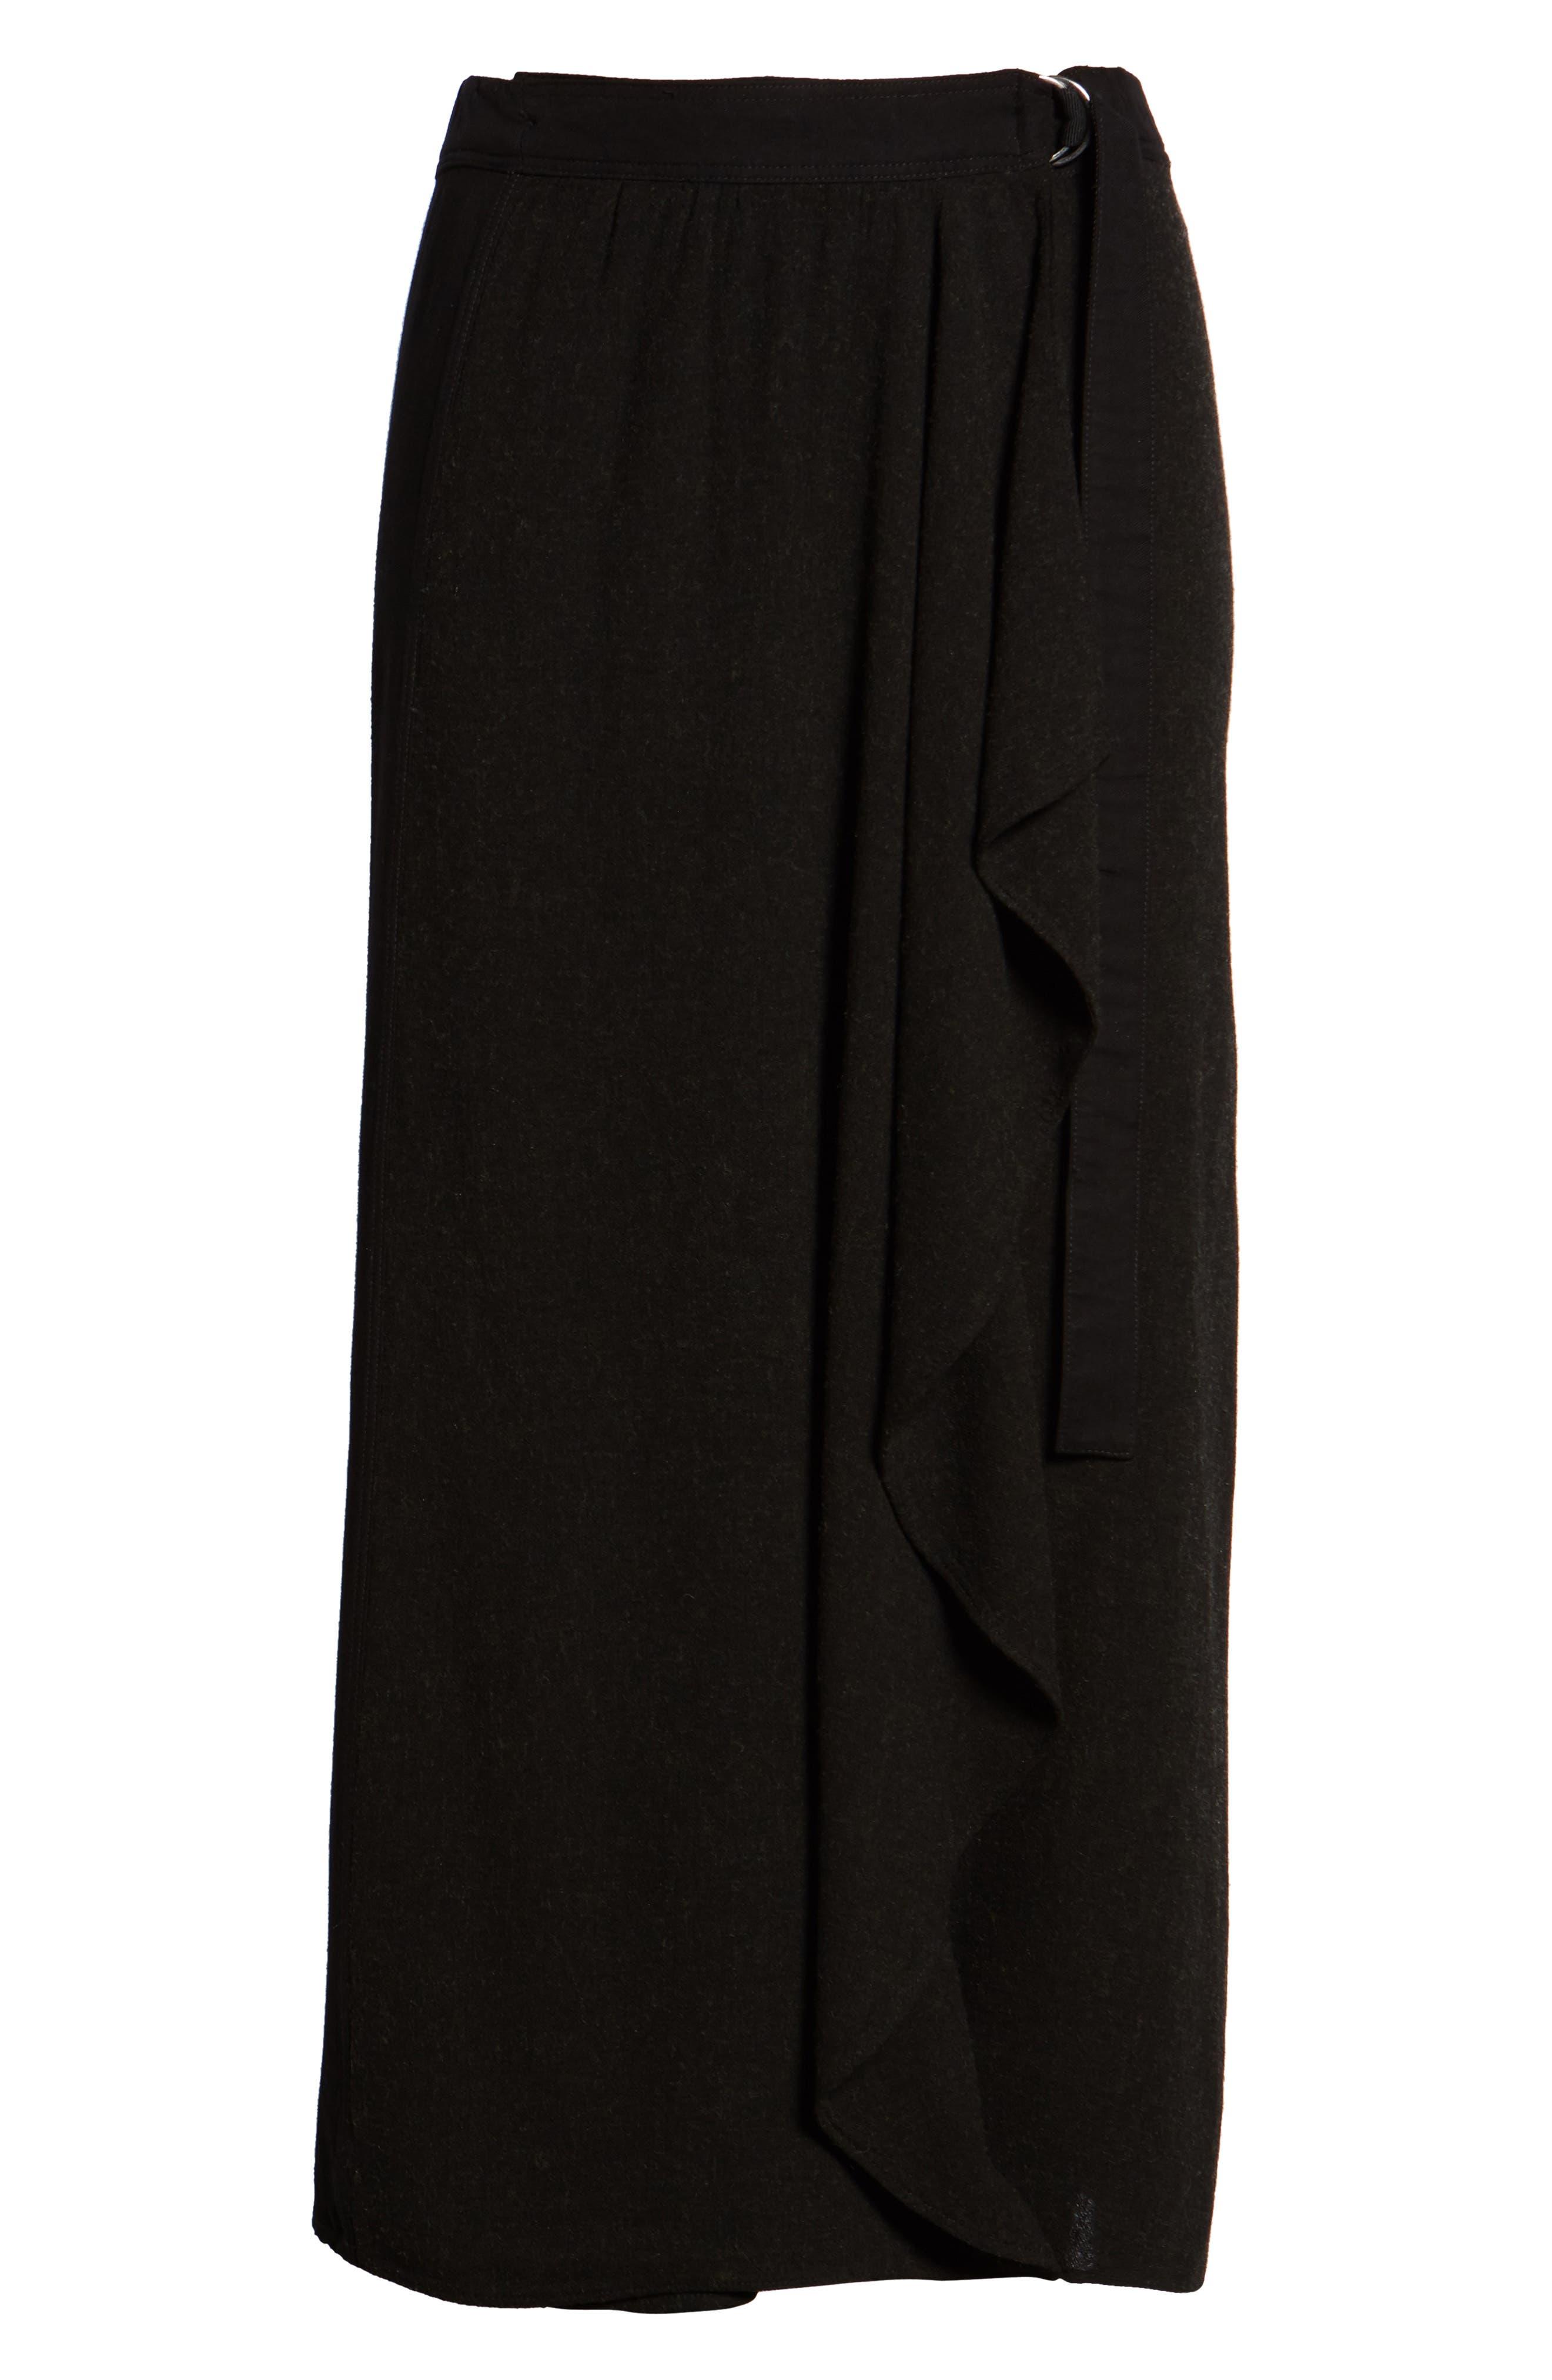 Midi Skirt,                             Alternate thumbnail 6, color,                             Black